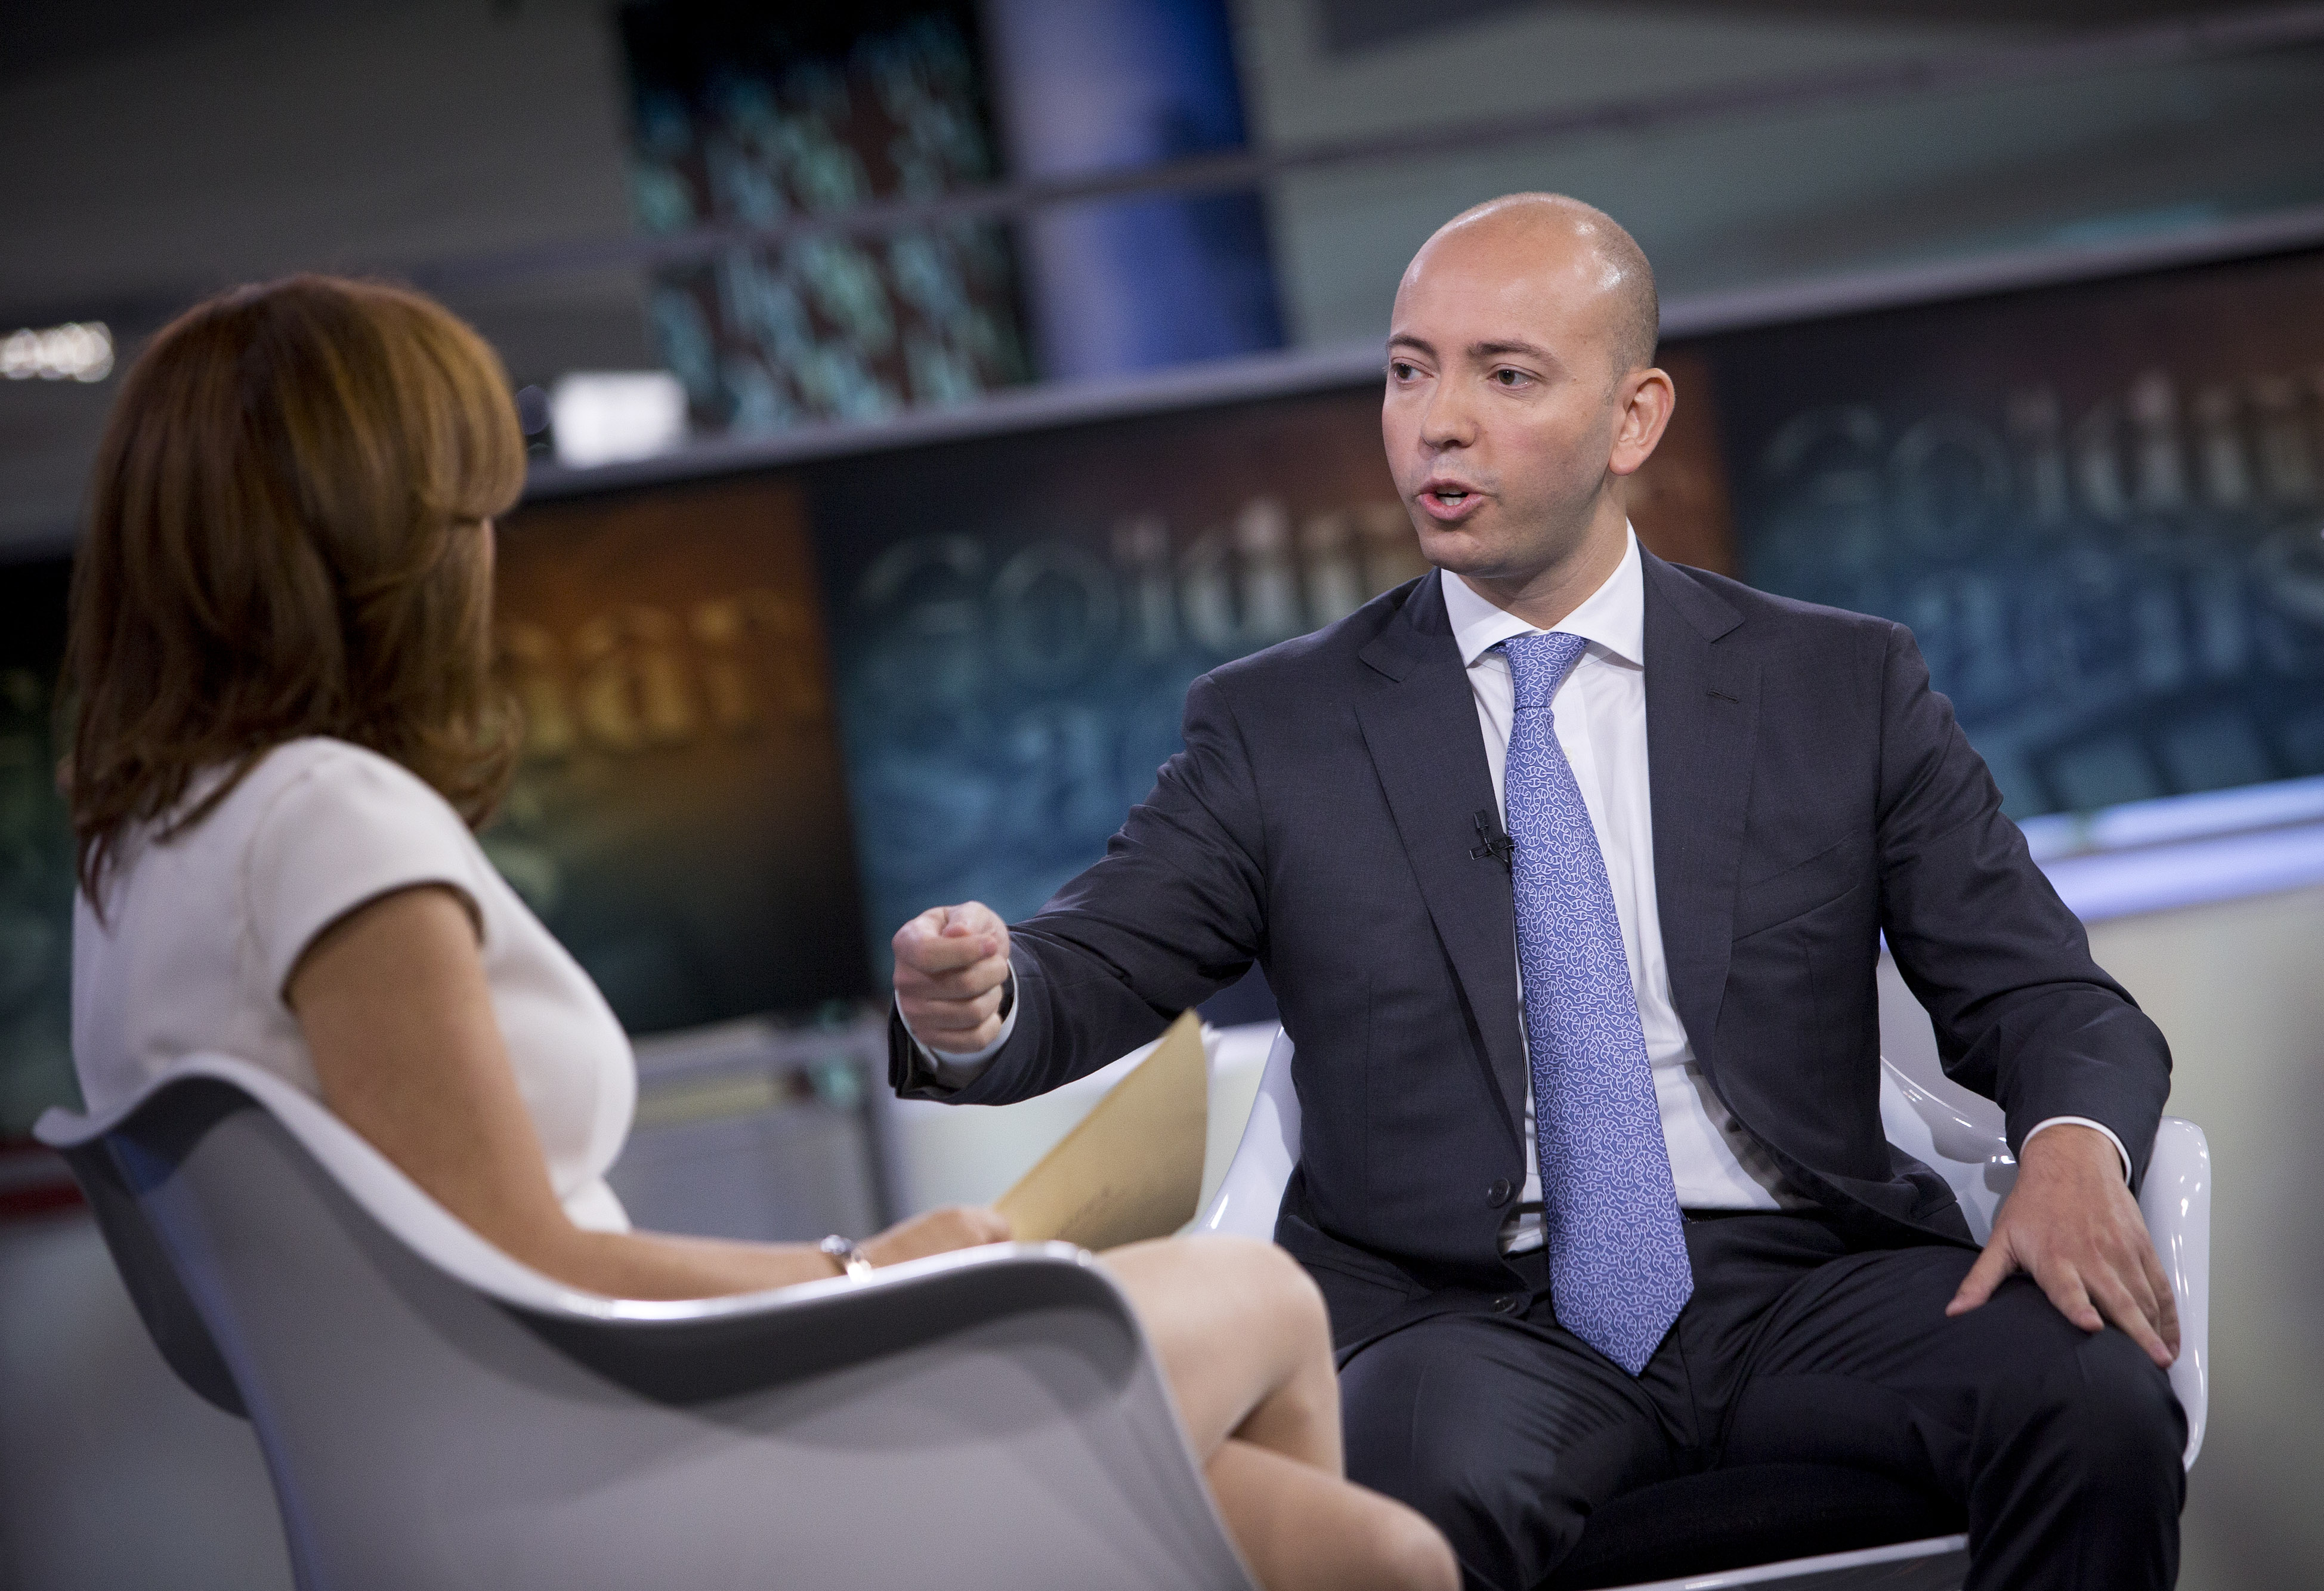 Former Goldman Sachs Executive Director Greg Smith Interview